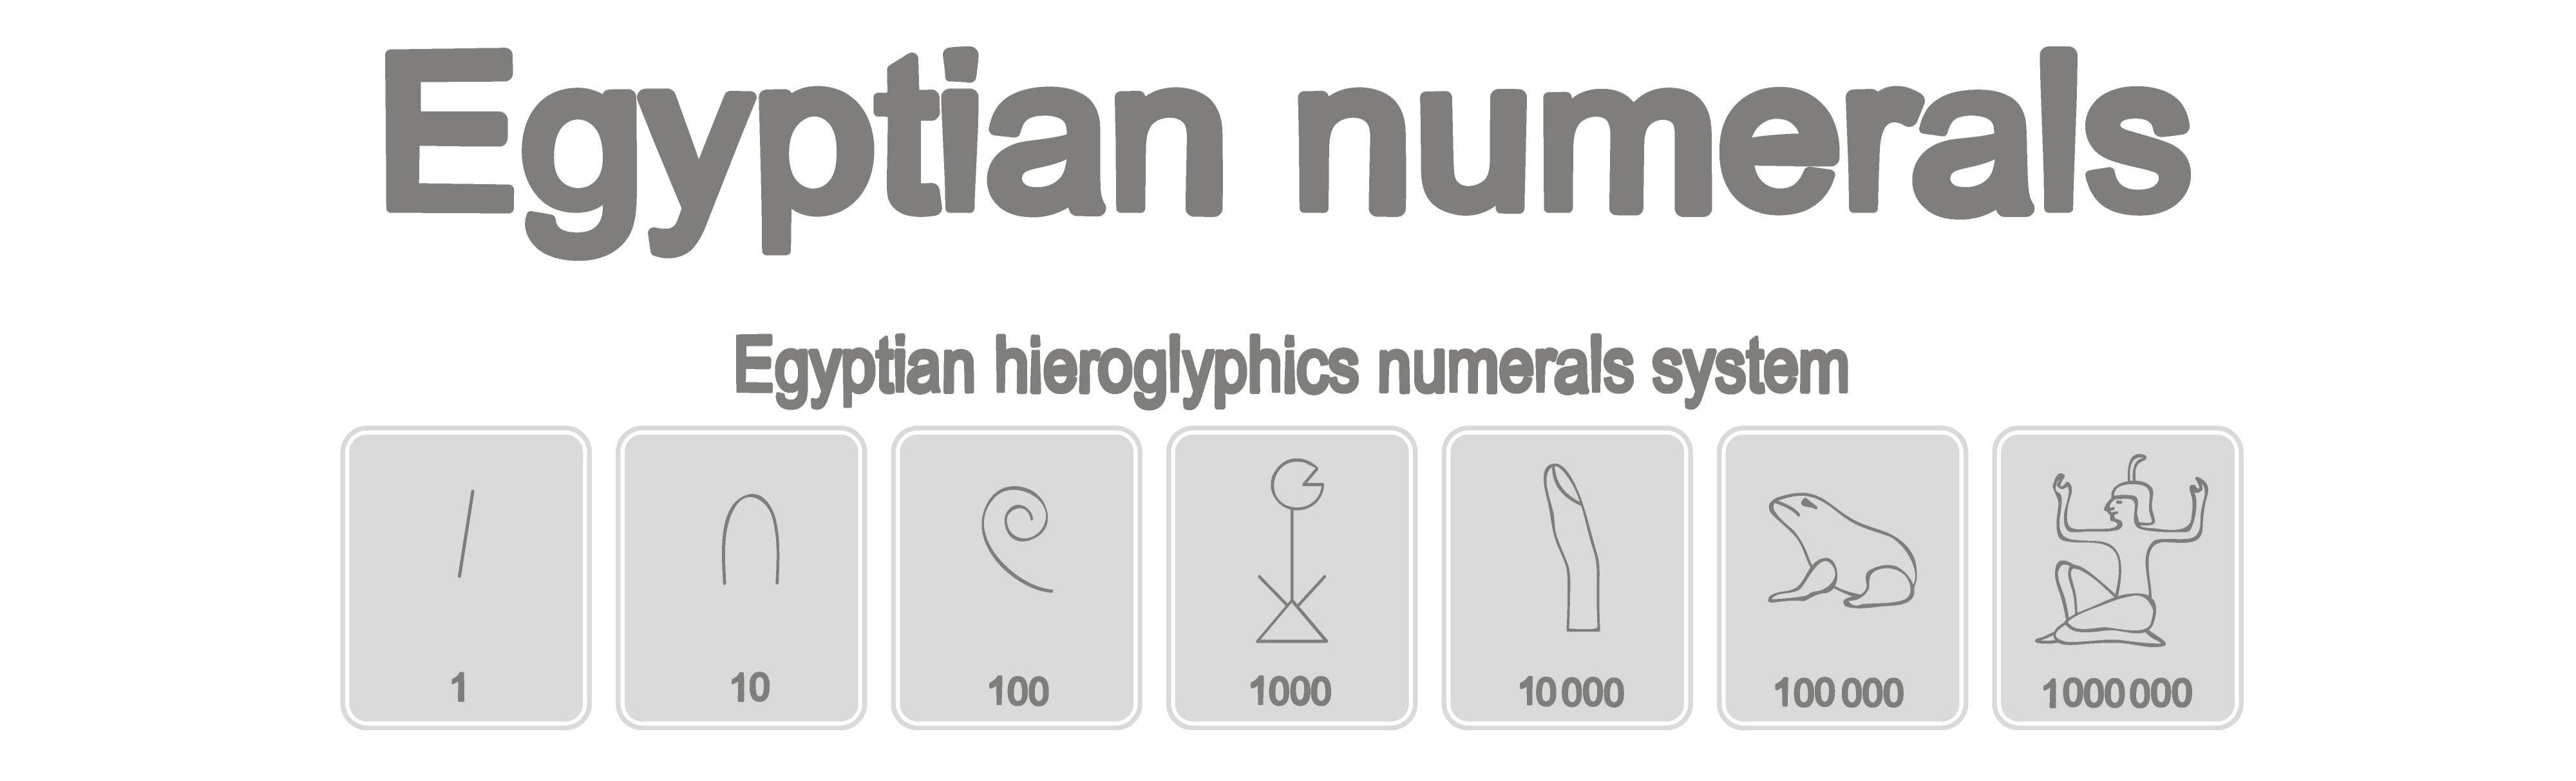 Egyptian hieroglyphic numbers